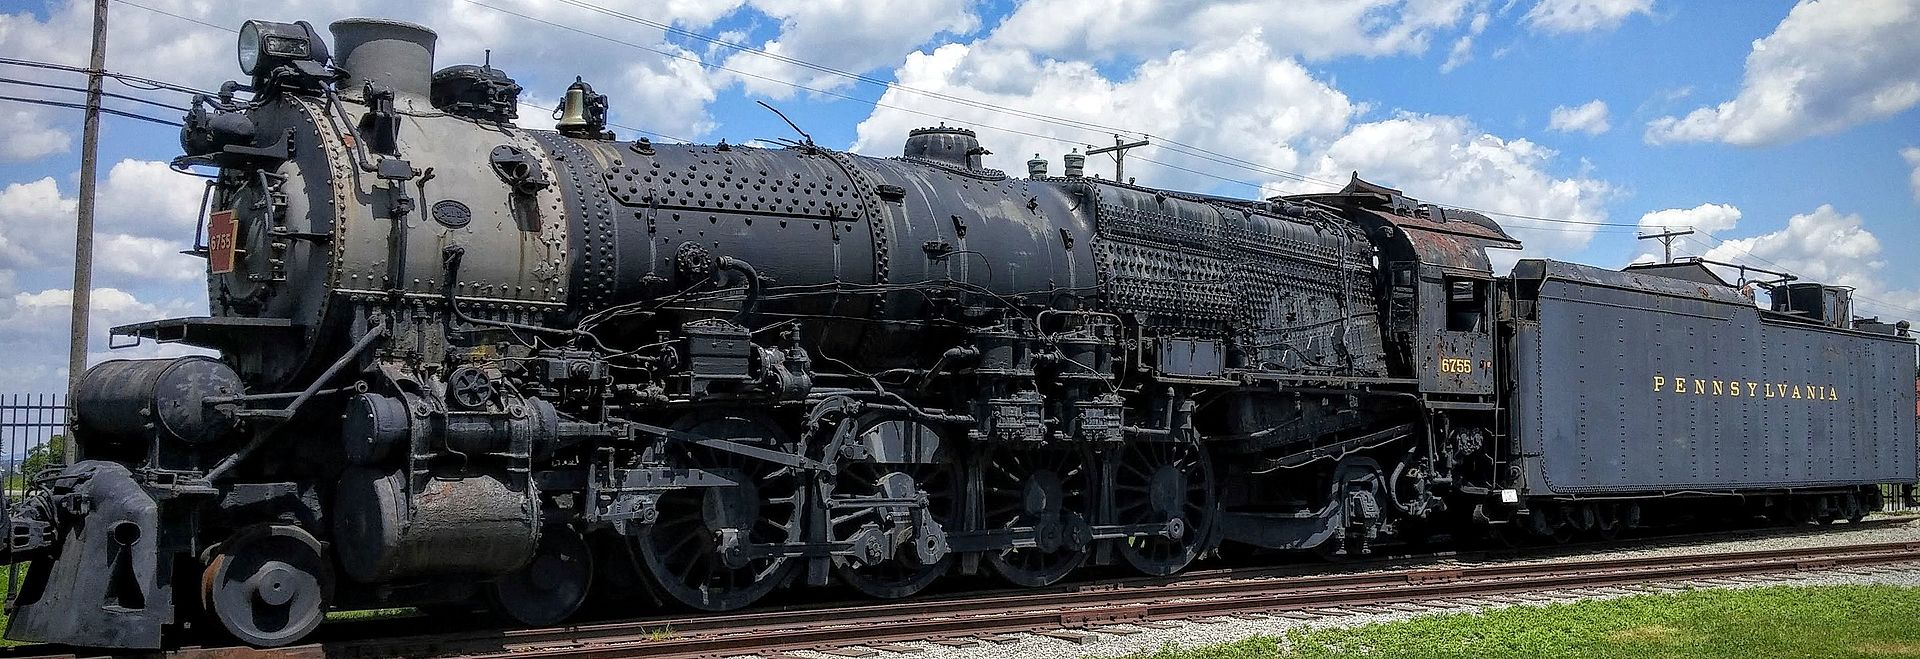 Rail - Locomotive - Steam - 4-8-2 Mountain M1